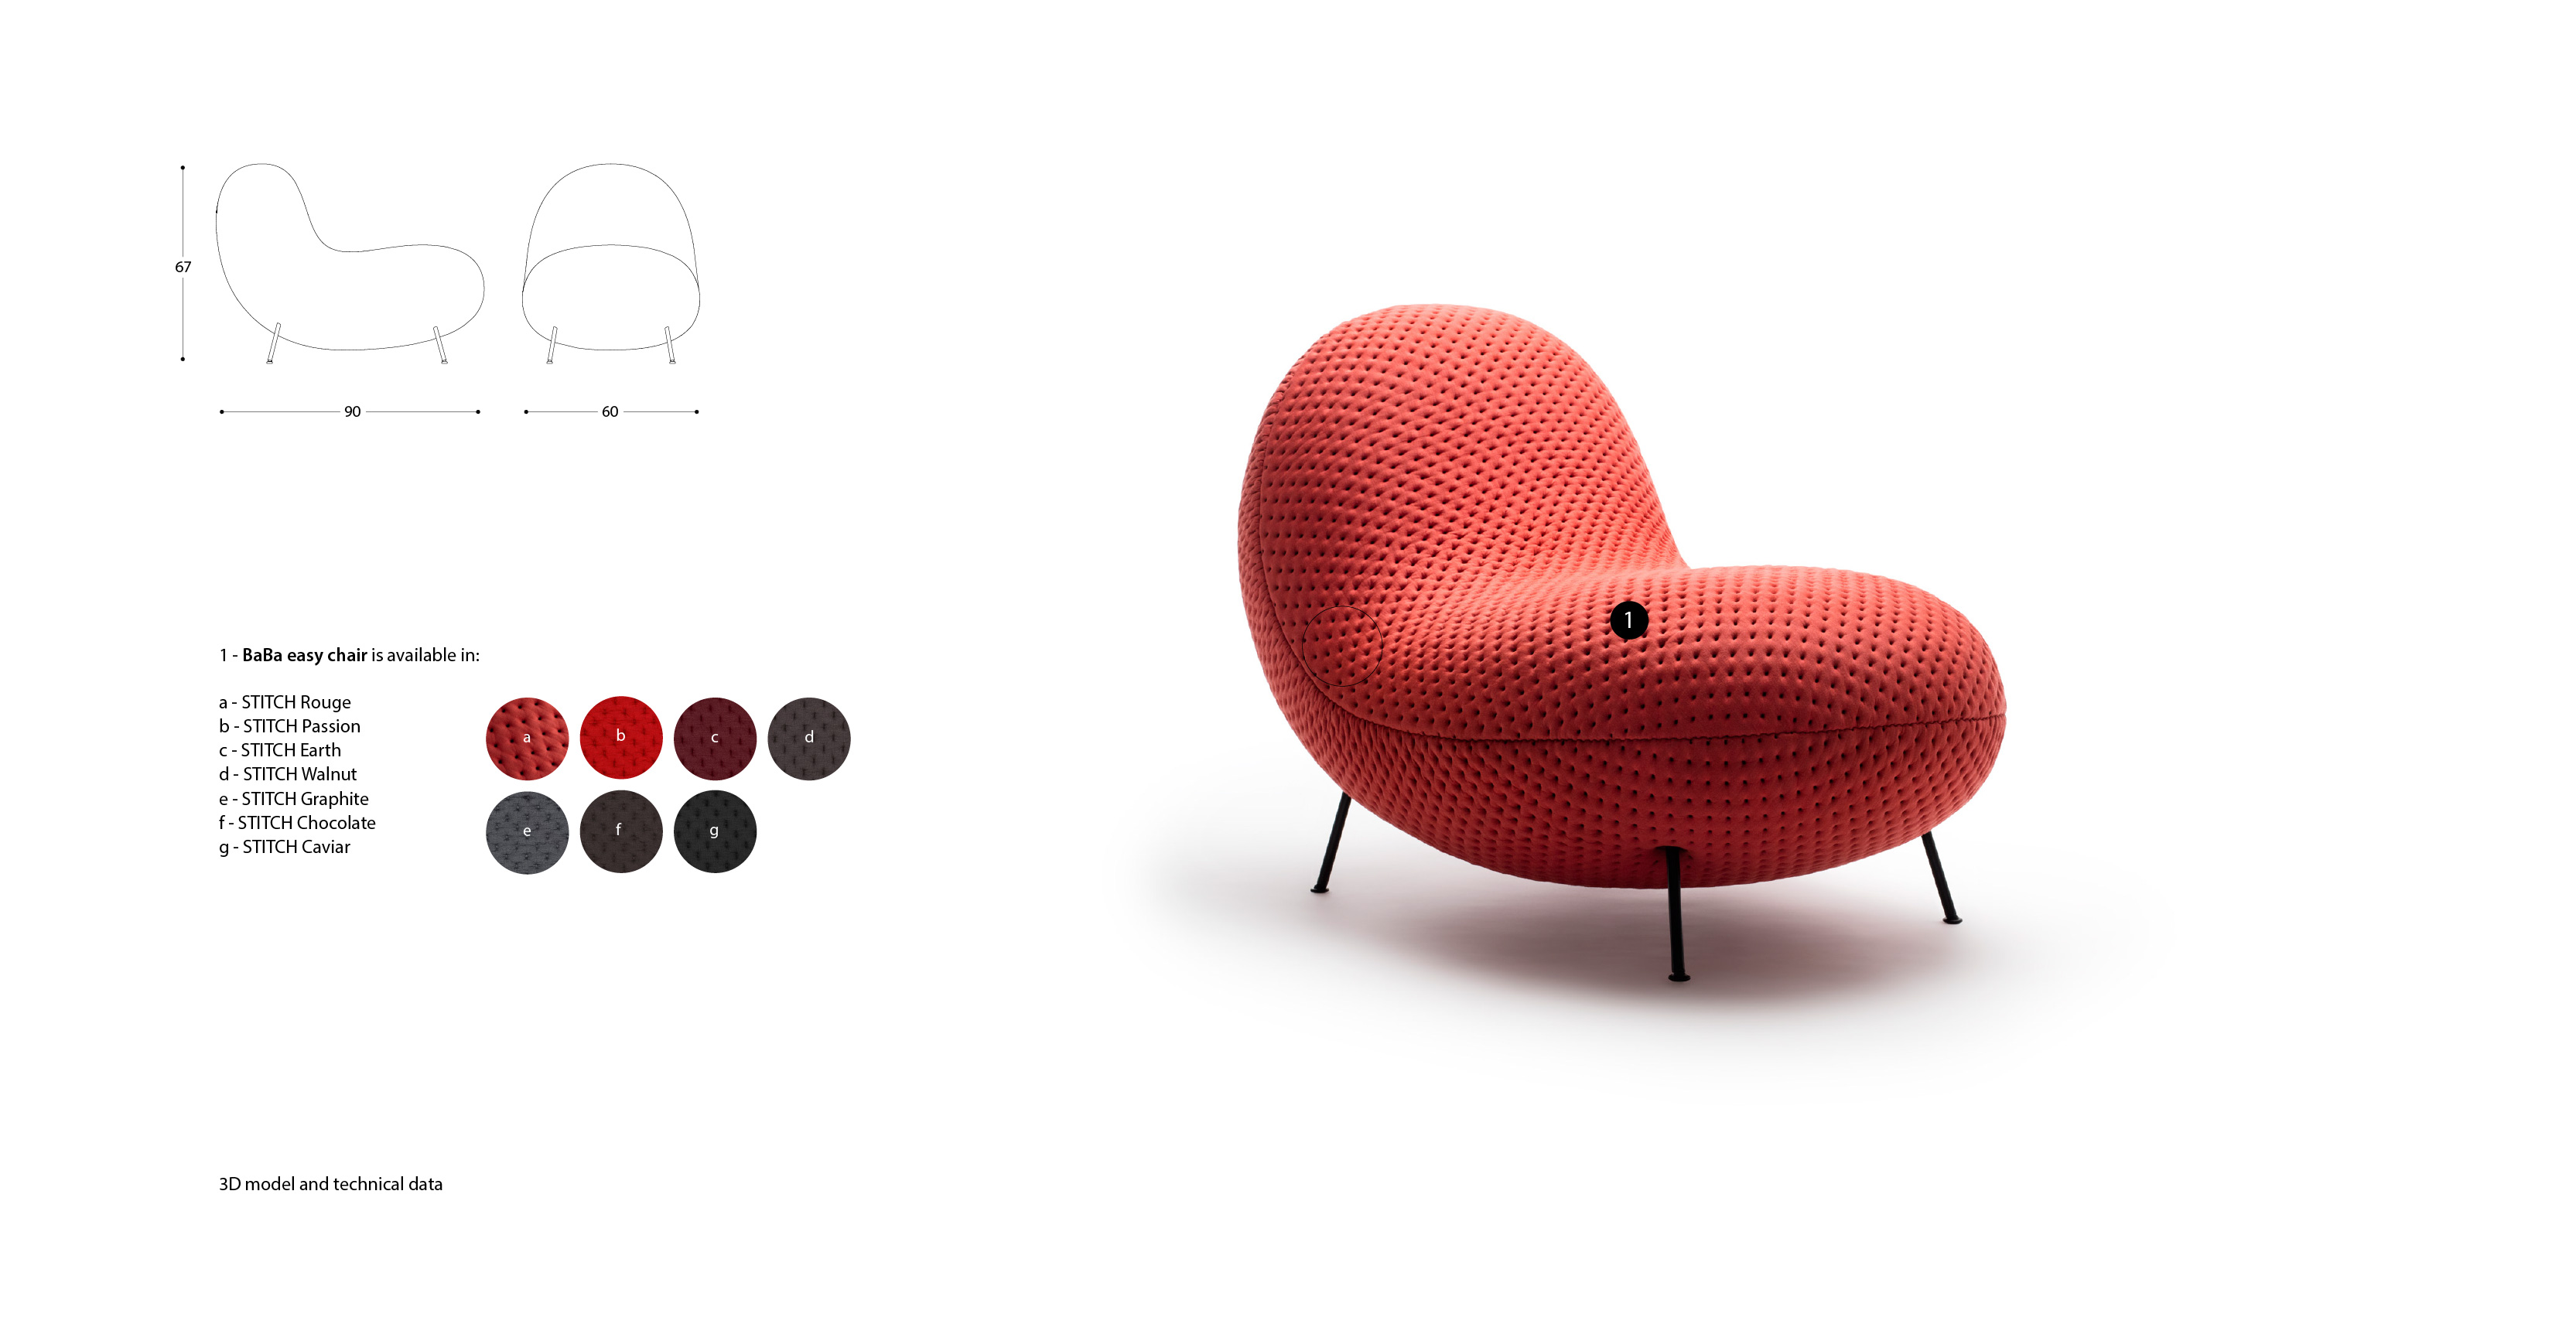 baba-easy-chair-technical